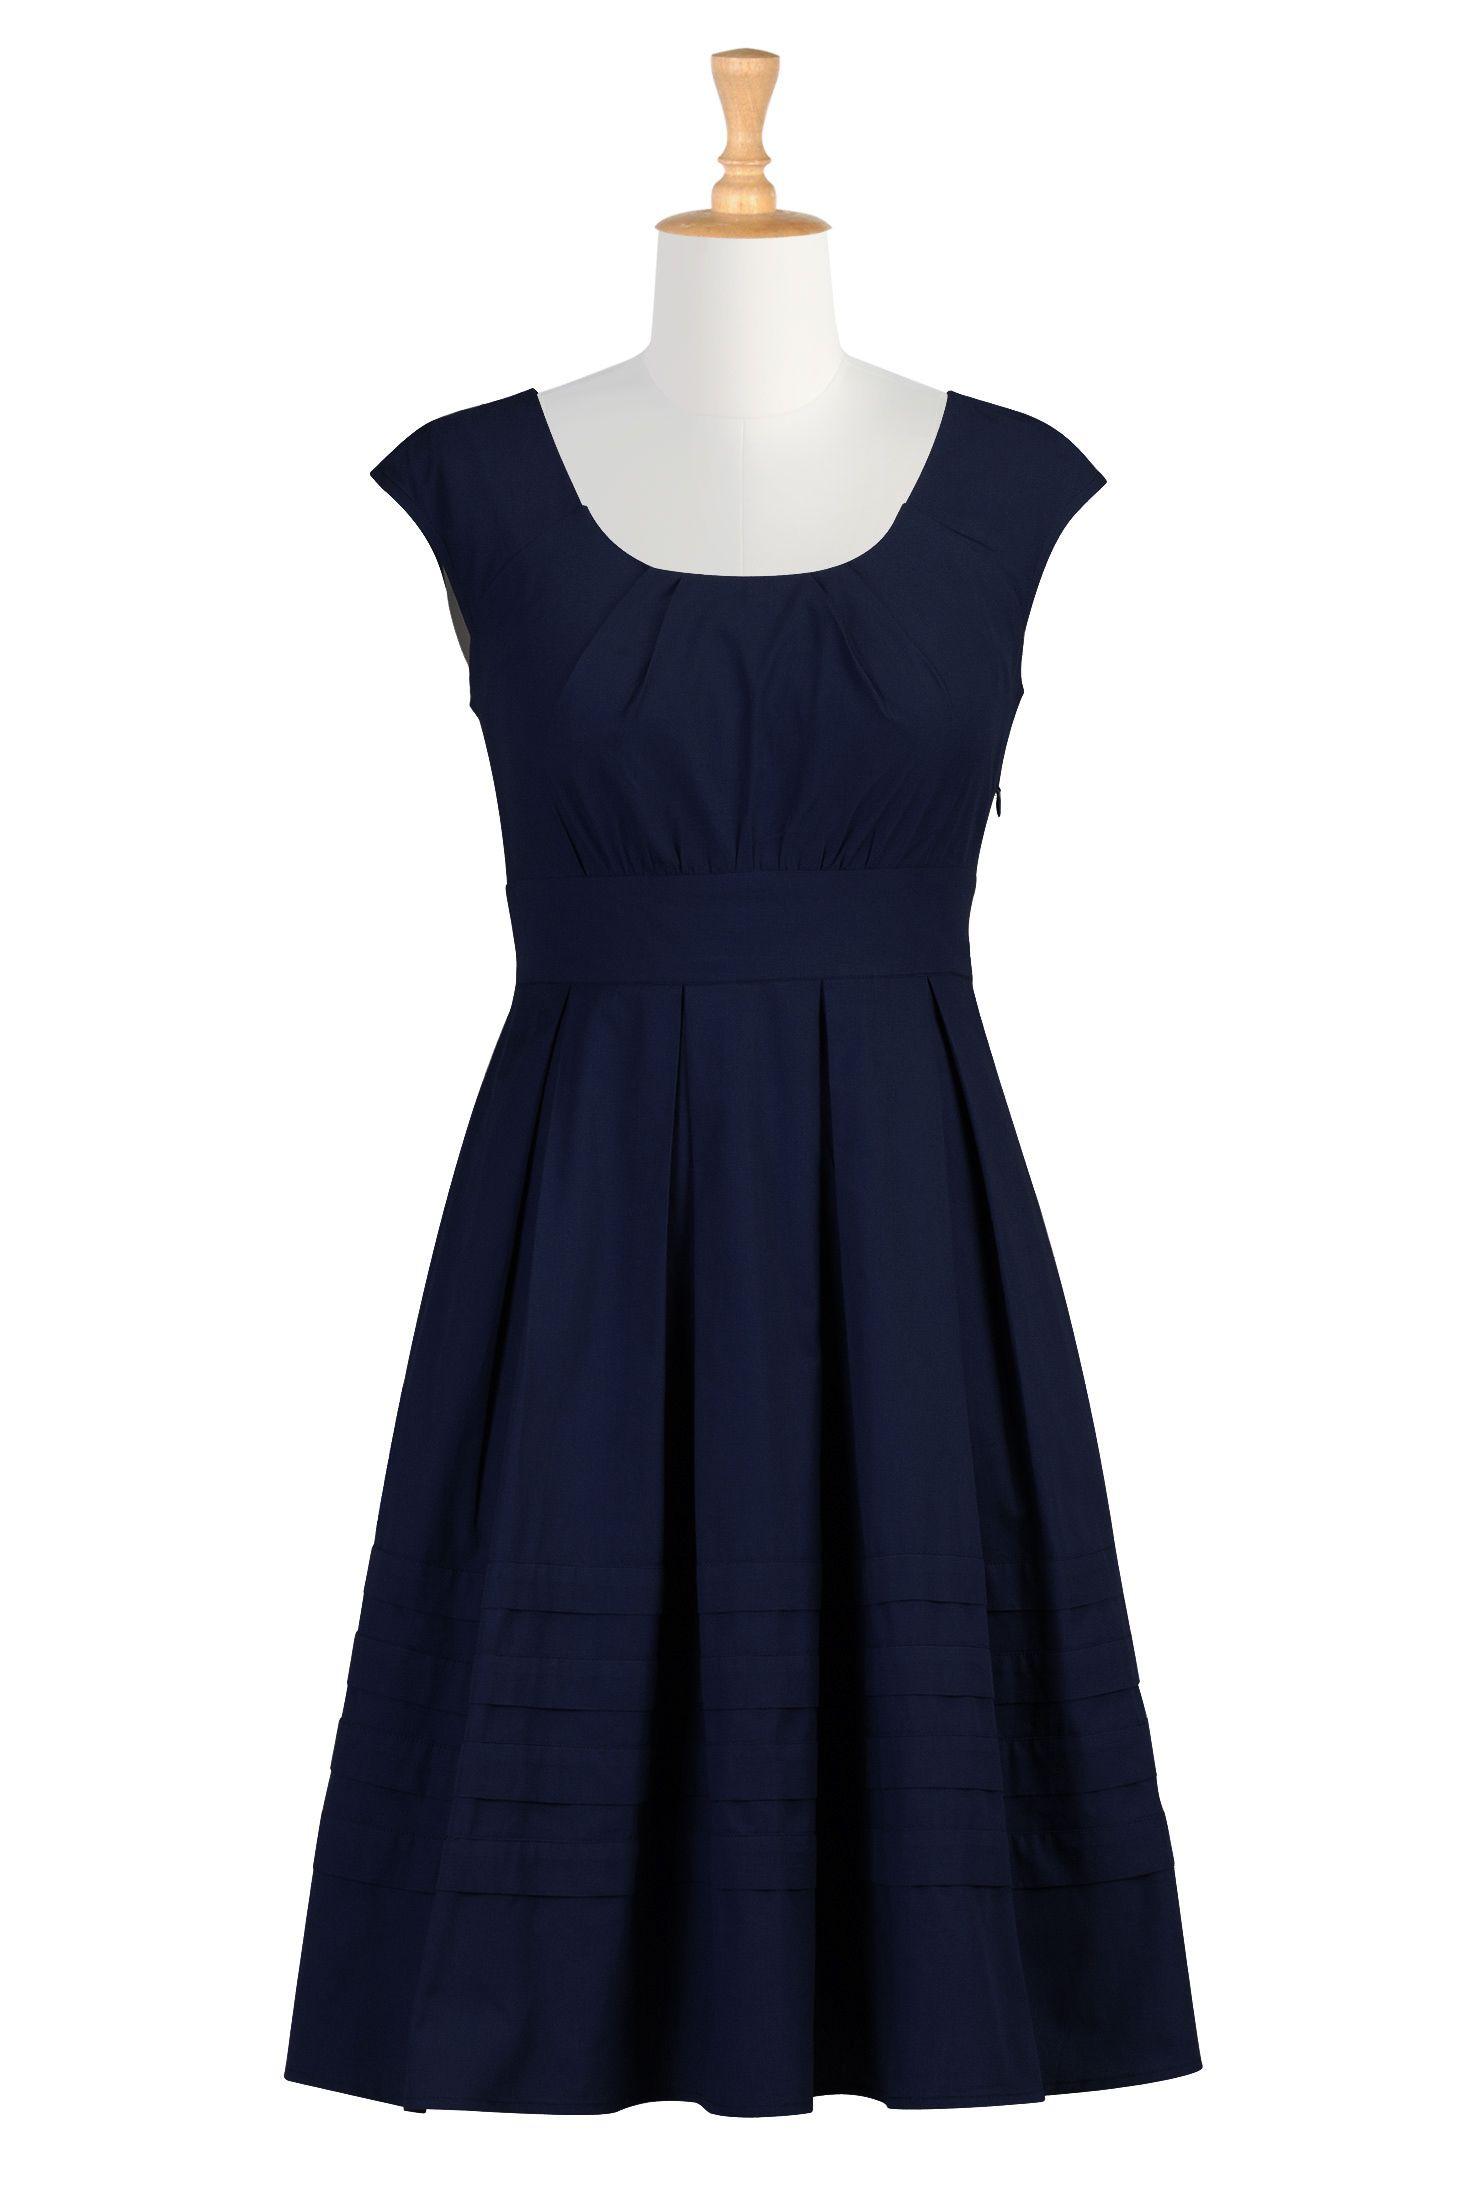 1000  images about Dresses on Pinterest  Cotton summer dresses ...